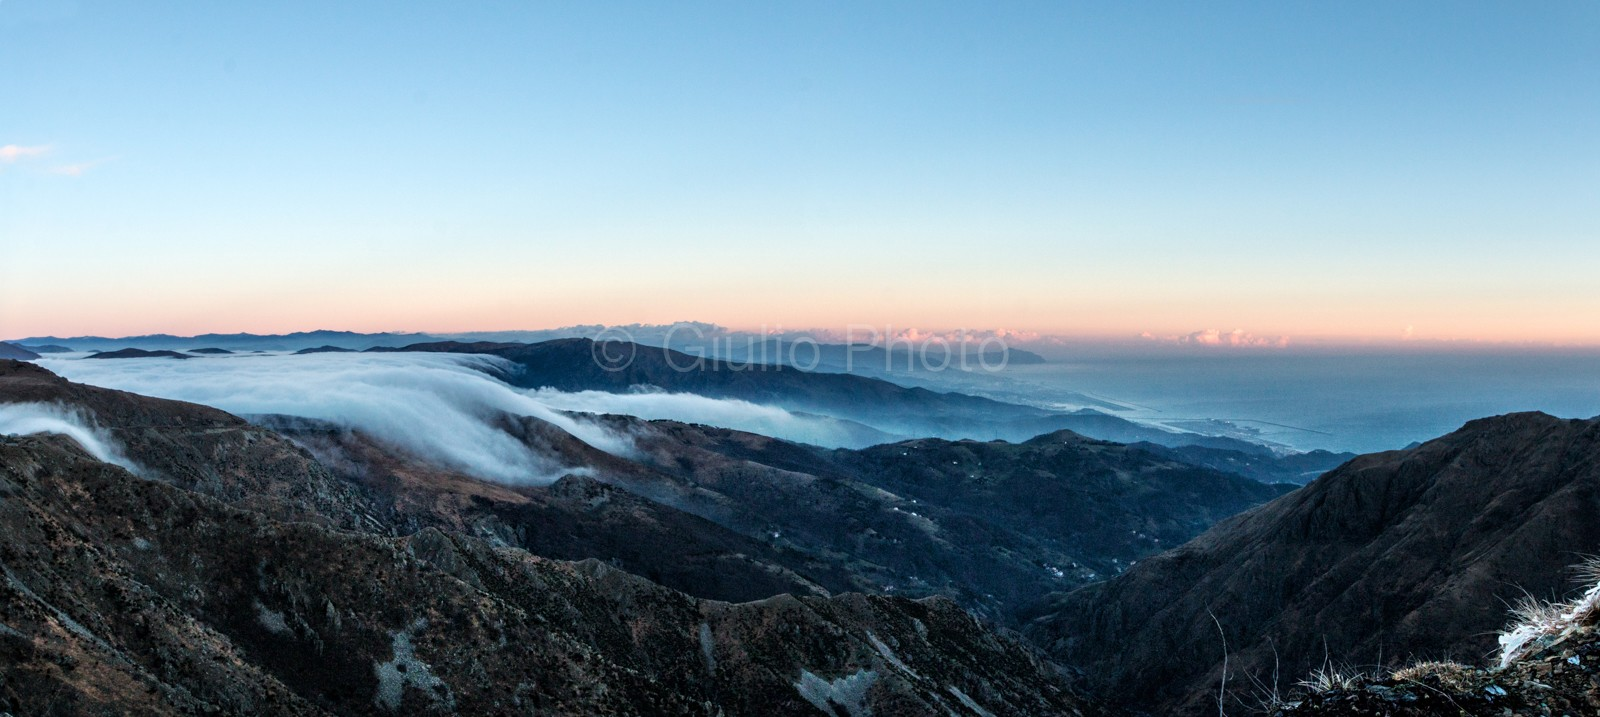 giulio photo foto paesaggi naturali immagini di paesaggi